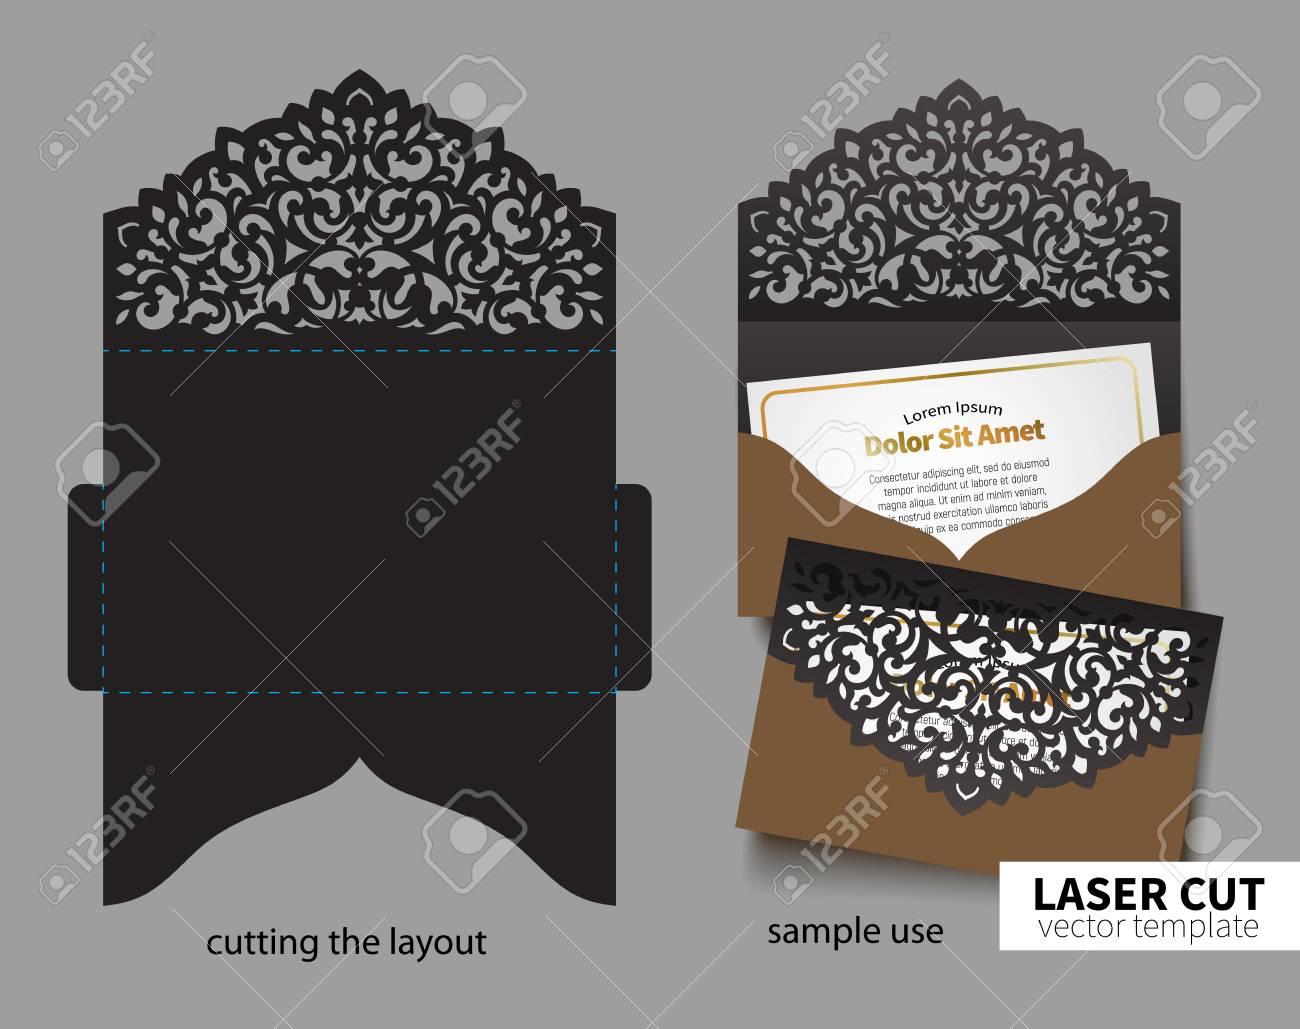 Digital vector file for laser cutting. Swirly ornate wedding invitation envelope. - 91101870